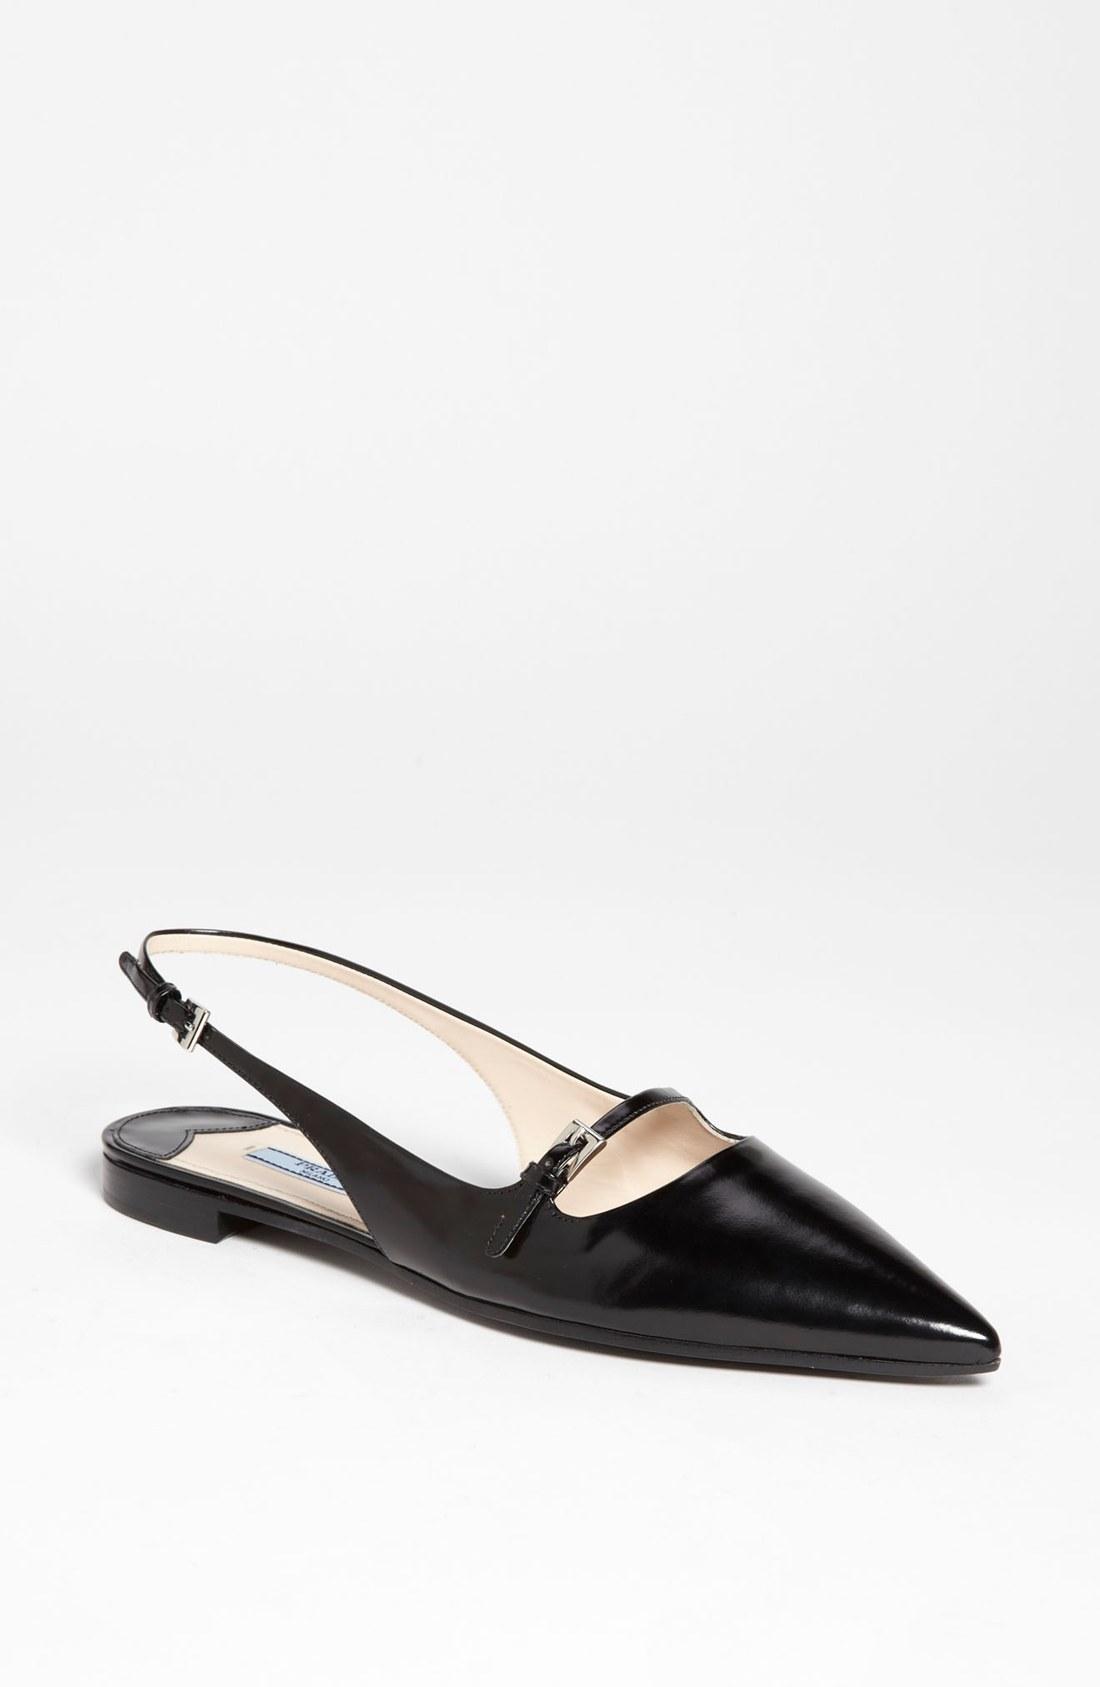 Nordstrom Prada Flat Shoes